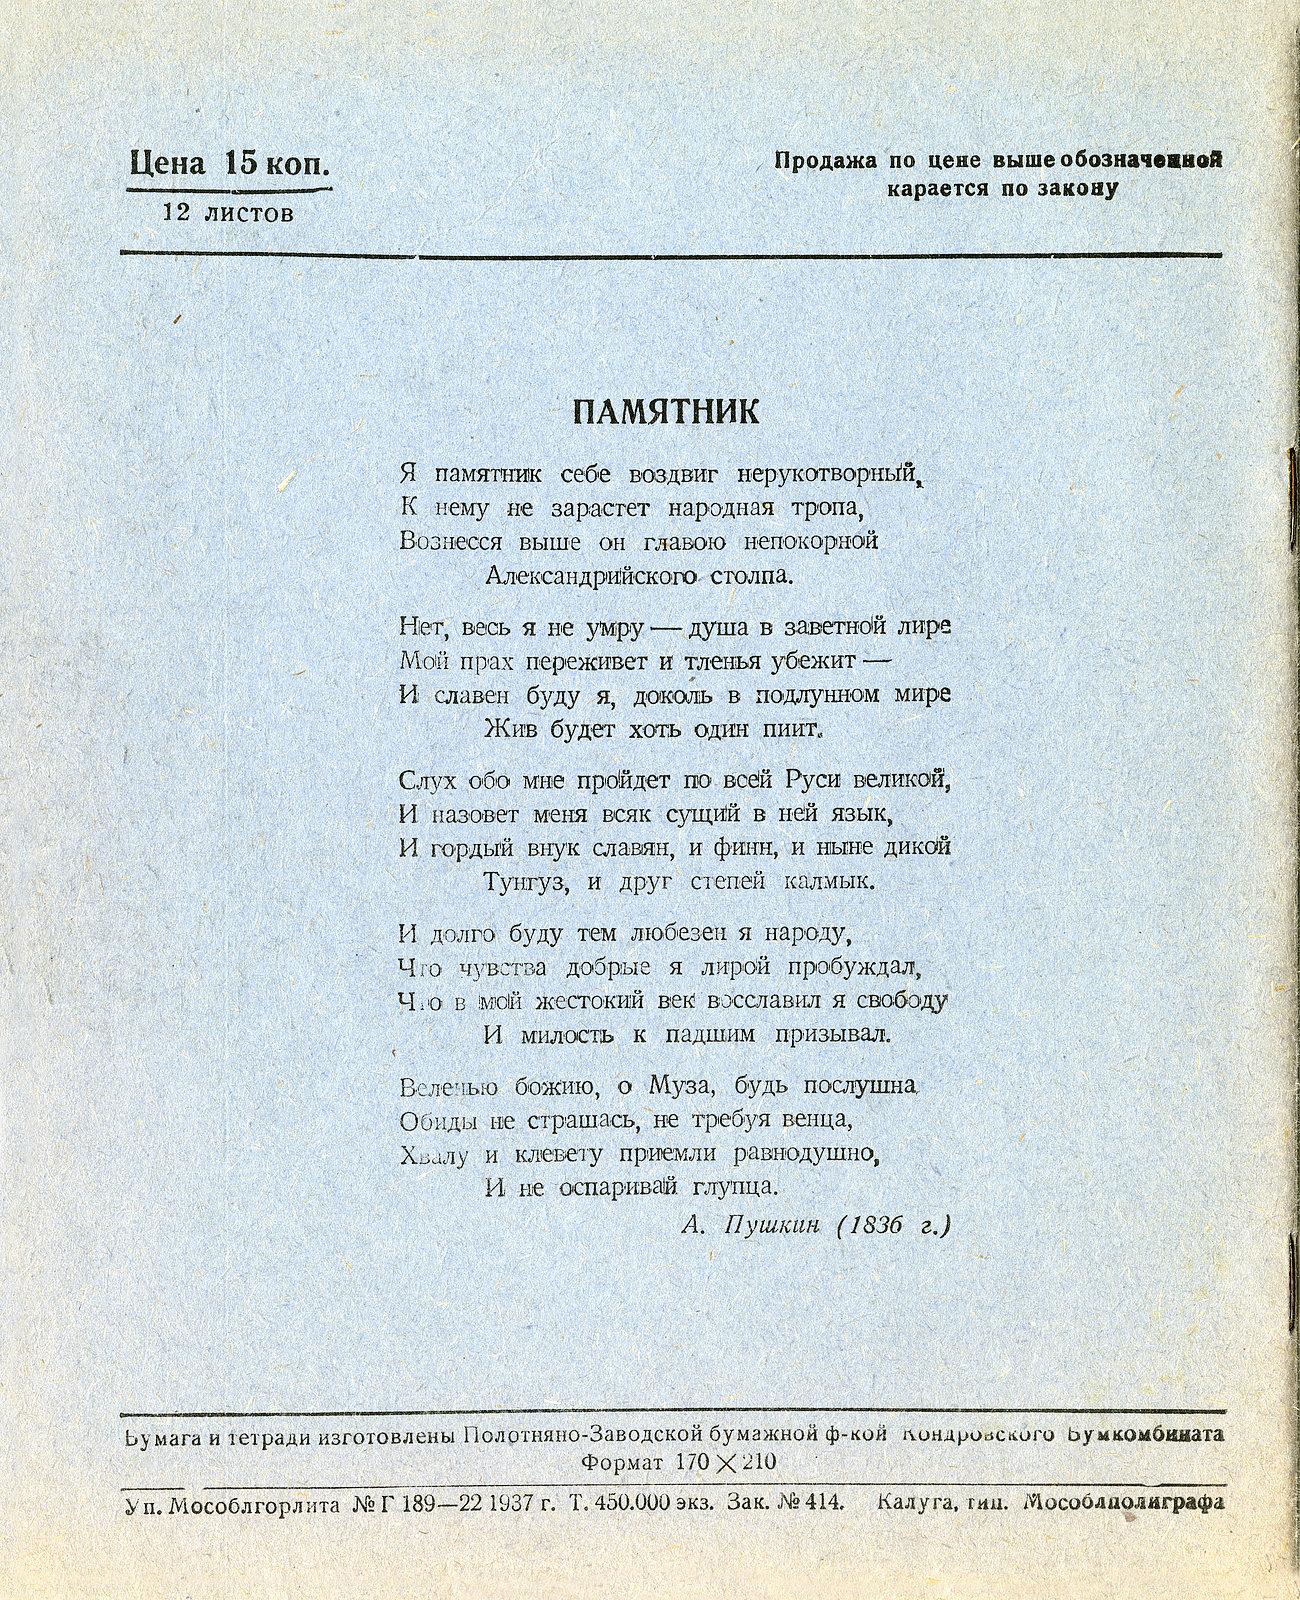 Тетрадь Пушкин, 1937, оборот